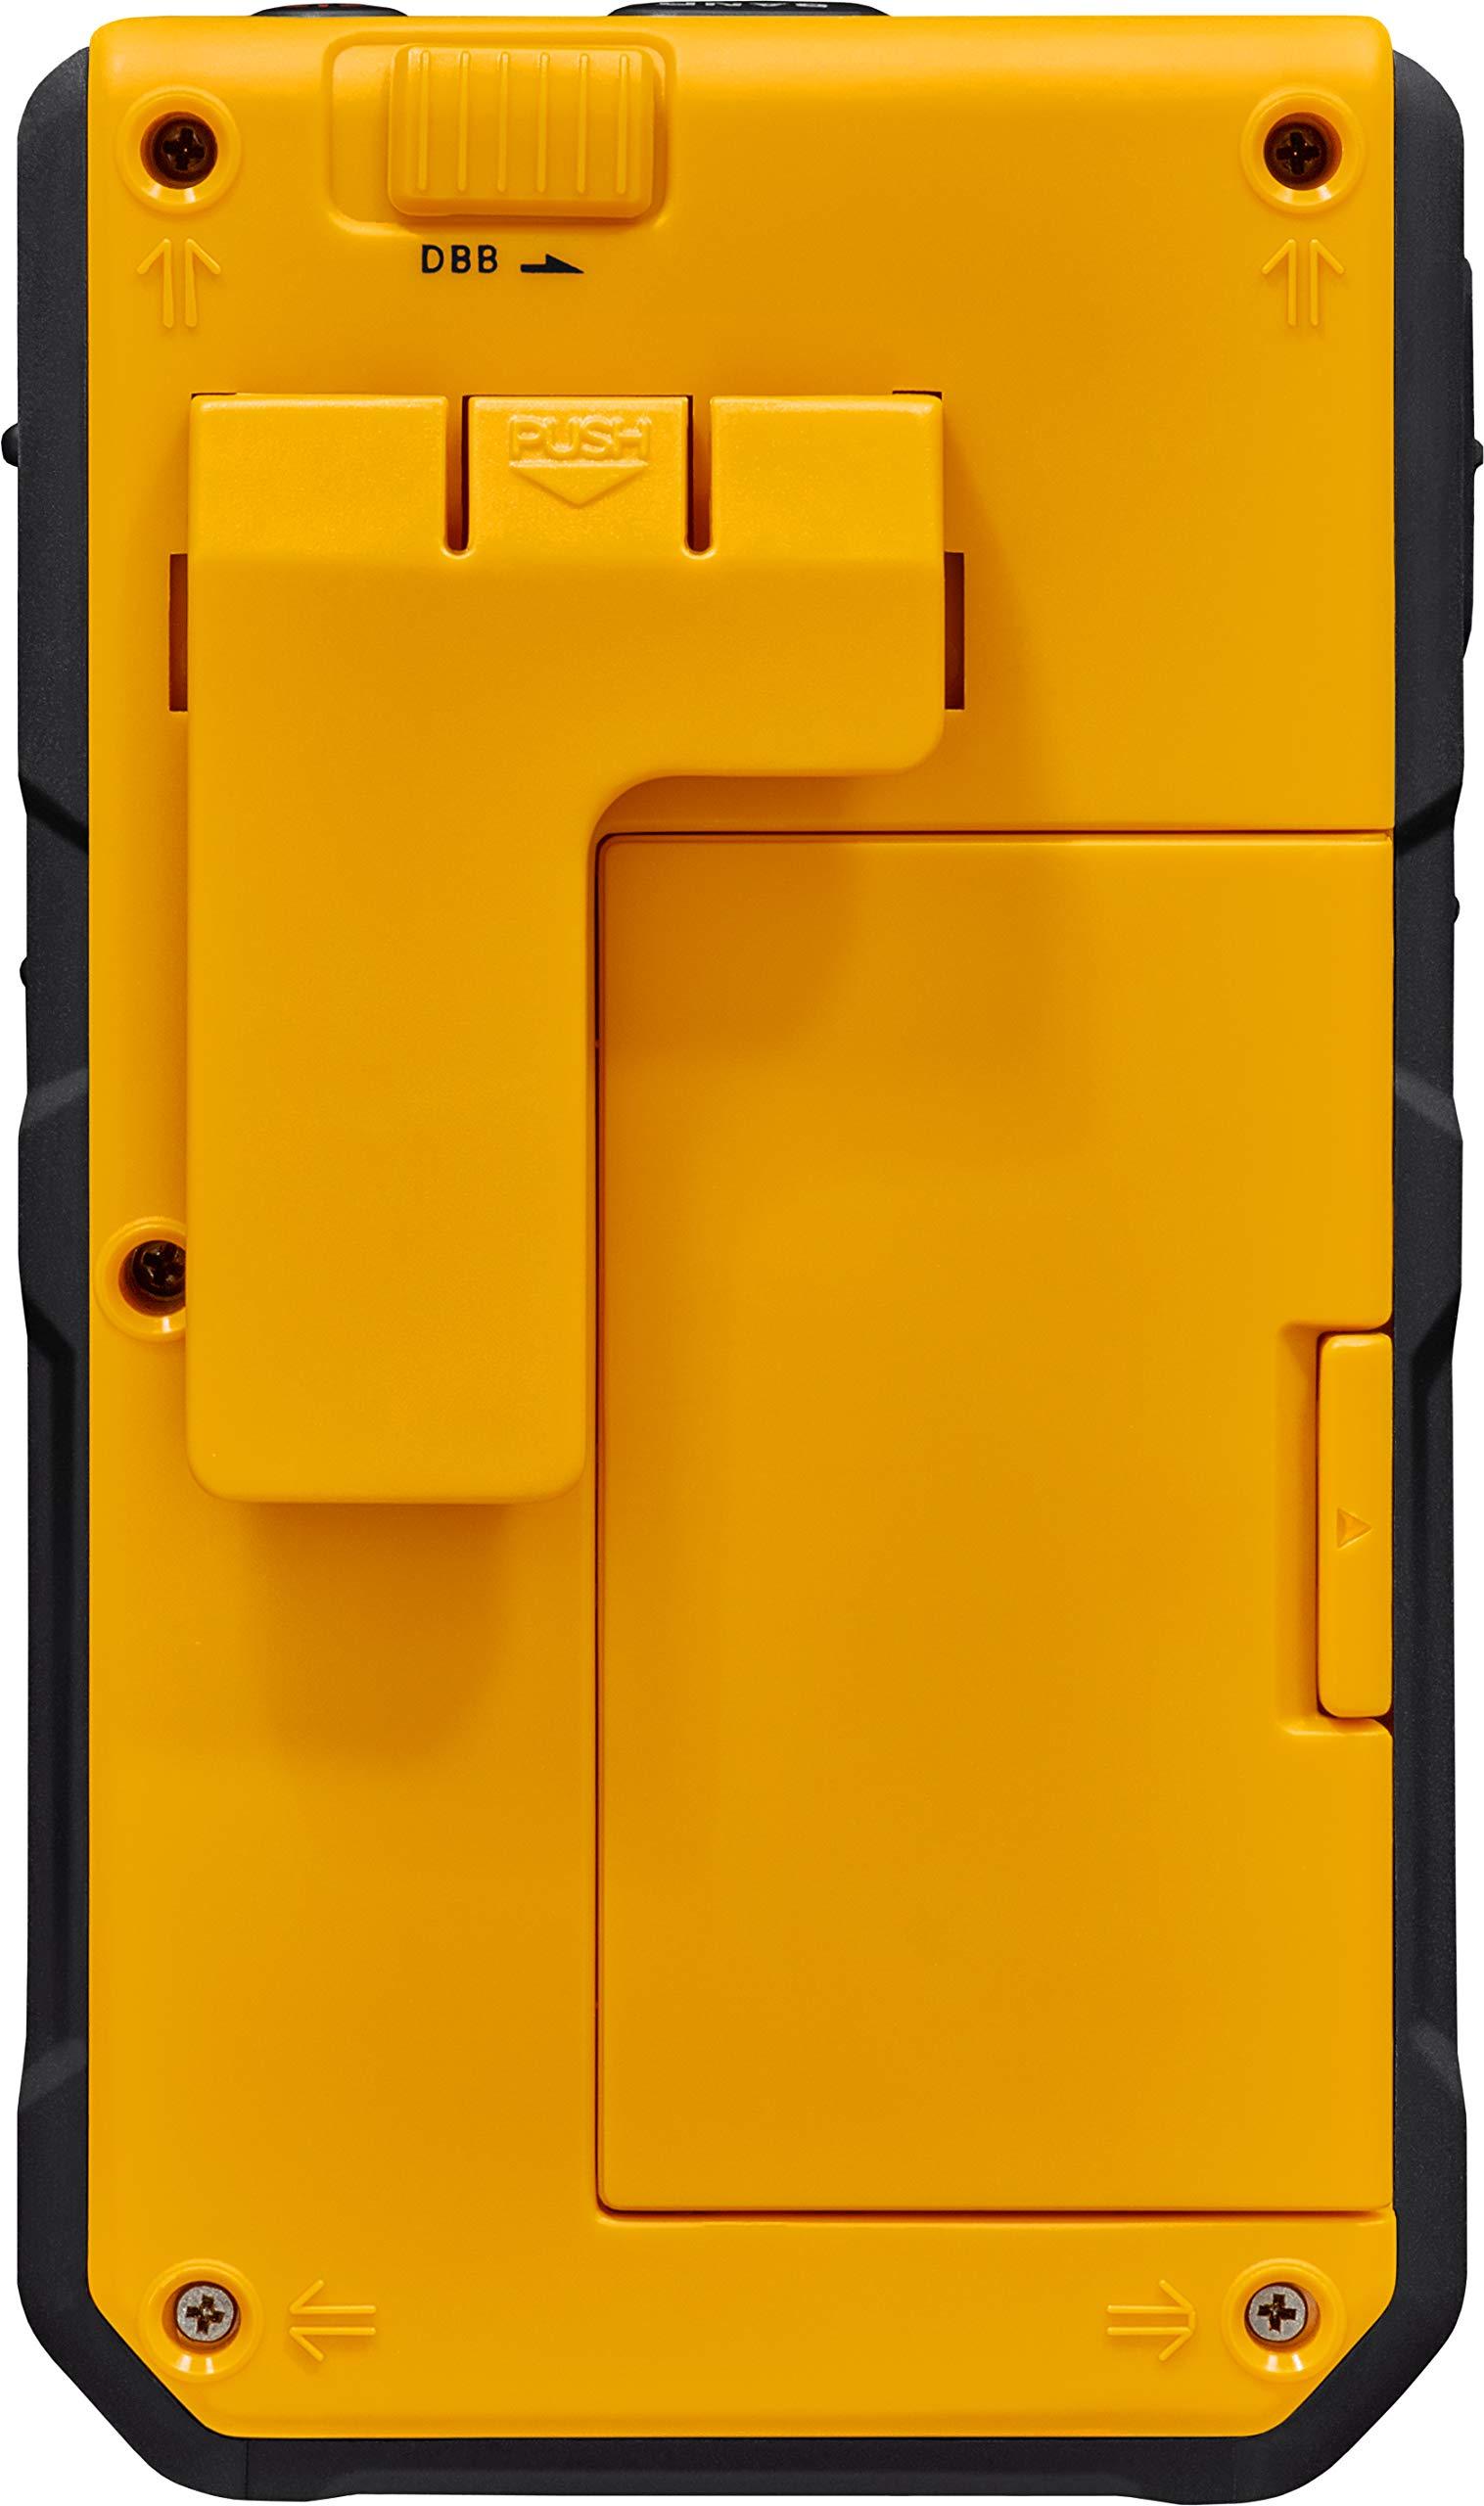 Sangean DT-800YL AM / FM / NOAA Weather Alert Rechargeable Pocket Radio (Yellow) by Saugeen America, Inc. (Image #5)